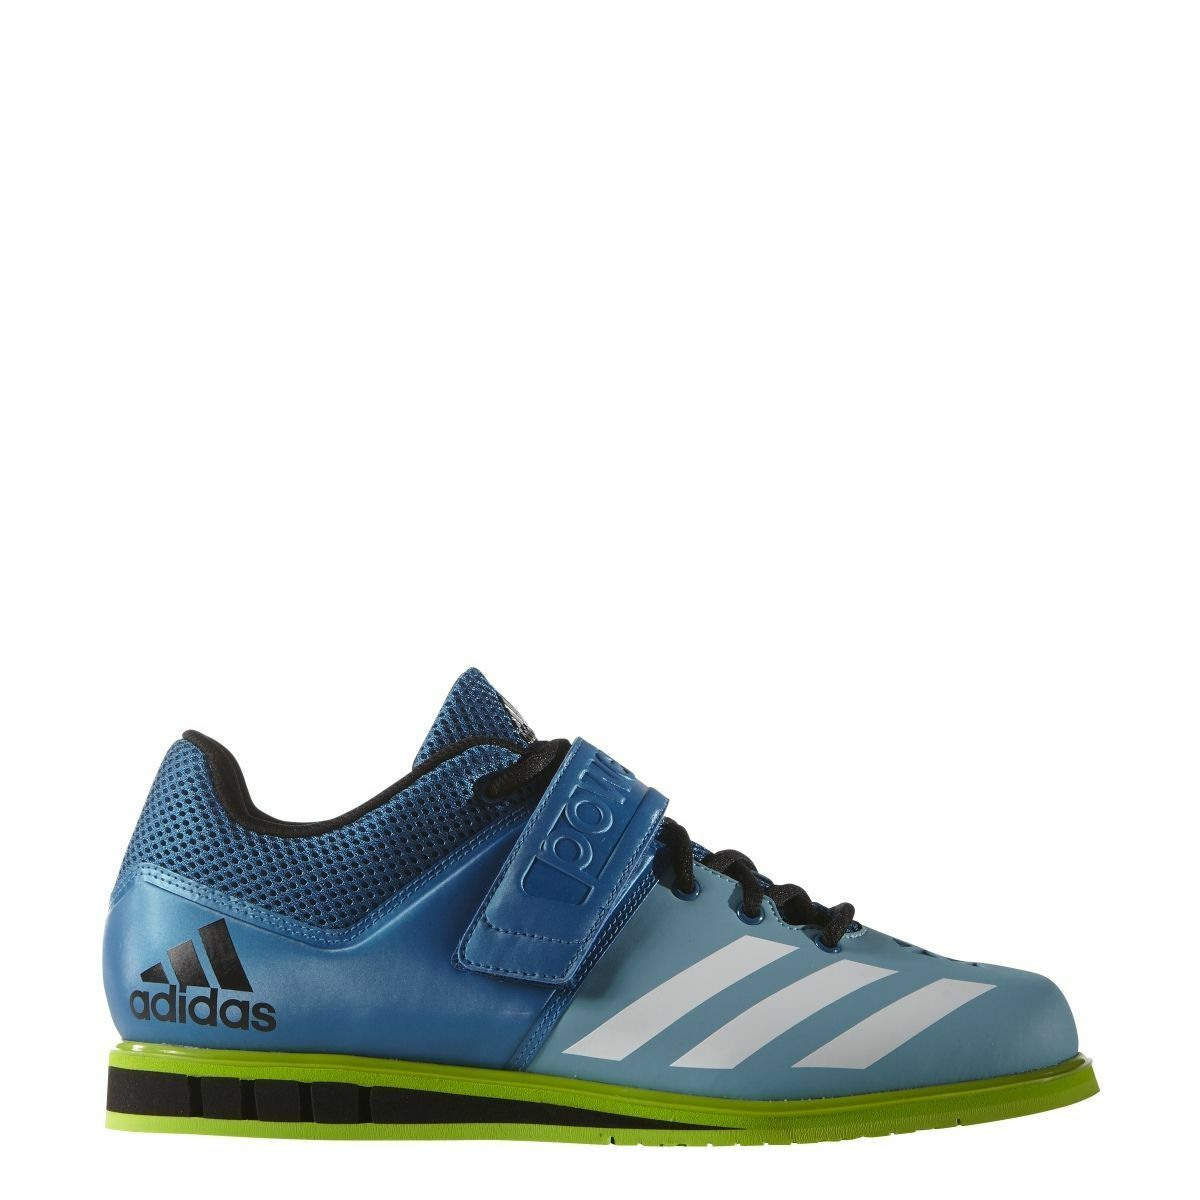 Adidas Powerlift 3 Mens bluee Weightlifting Athletic Training shoes AQ3331 Sz 16